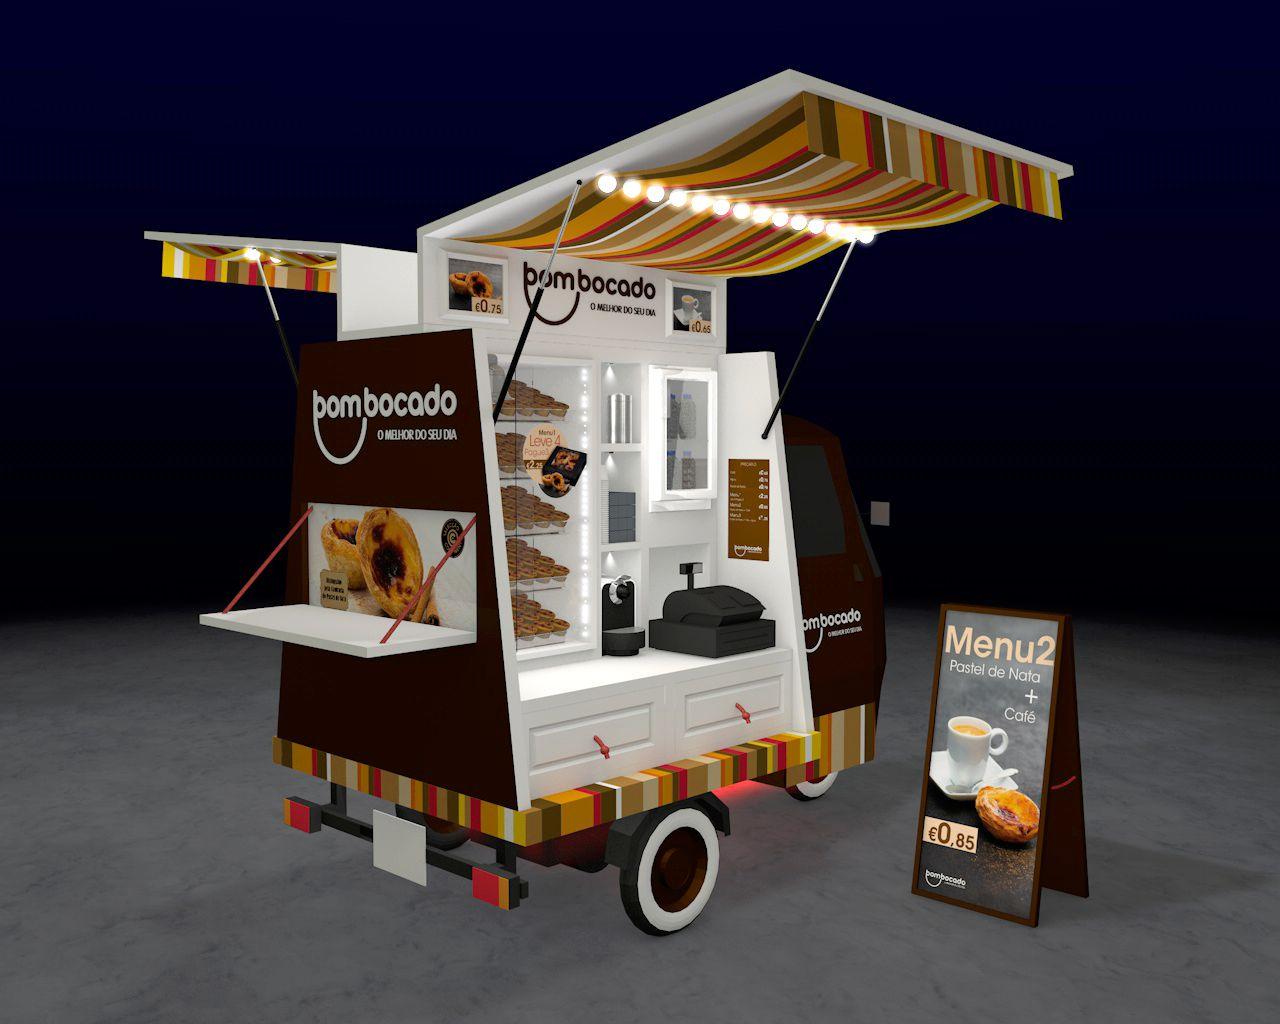 Cart design proposal for selling portuguese 'natas' near